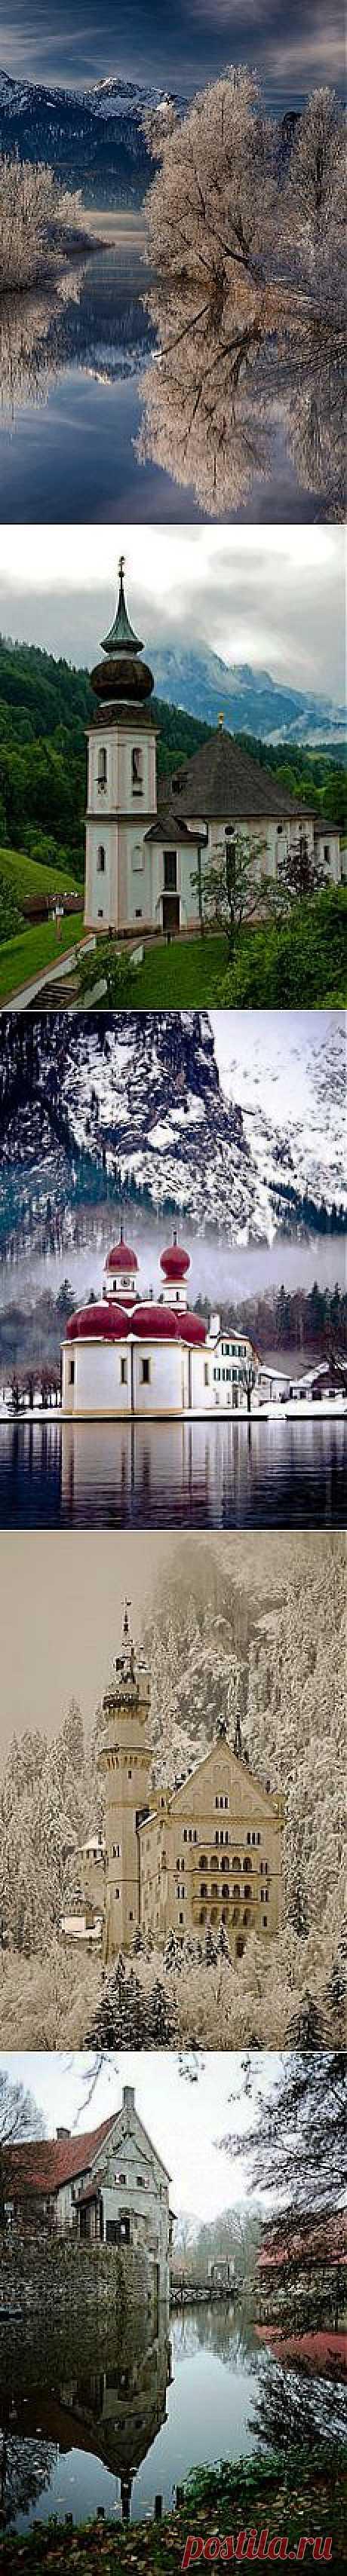 Wintery Lake - Baveria, Germany | Universe And Nature